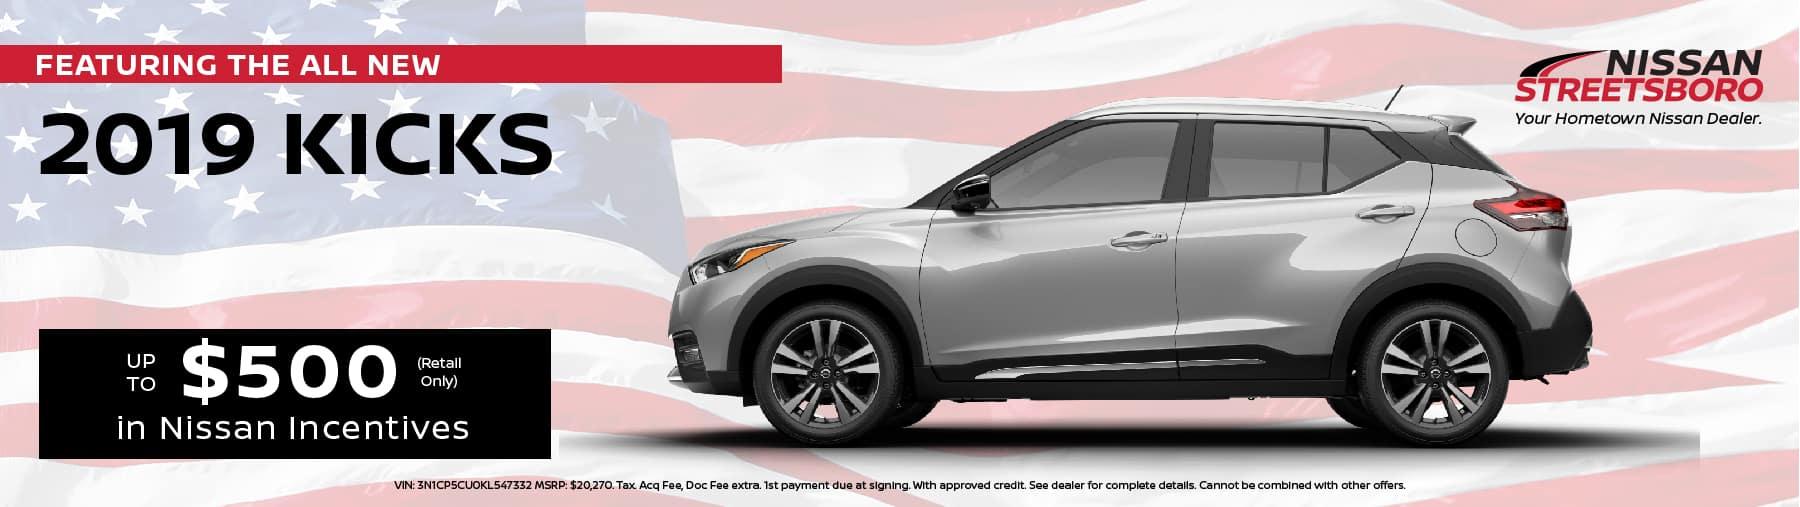 2019 Nissan Kicks Incentives